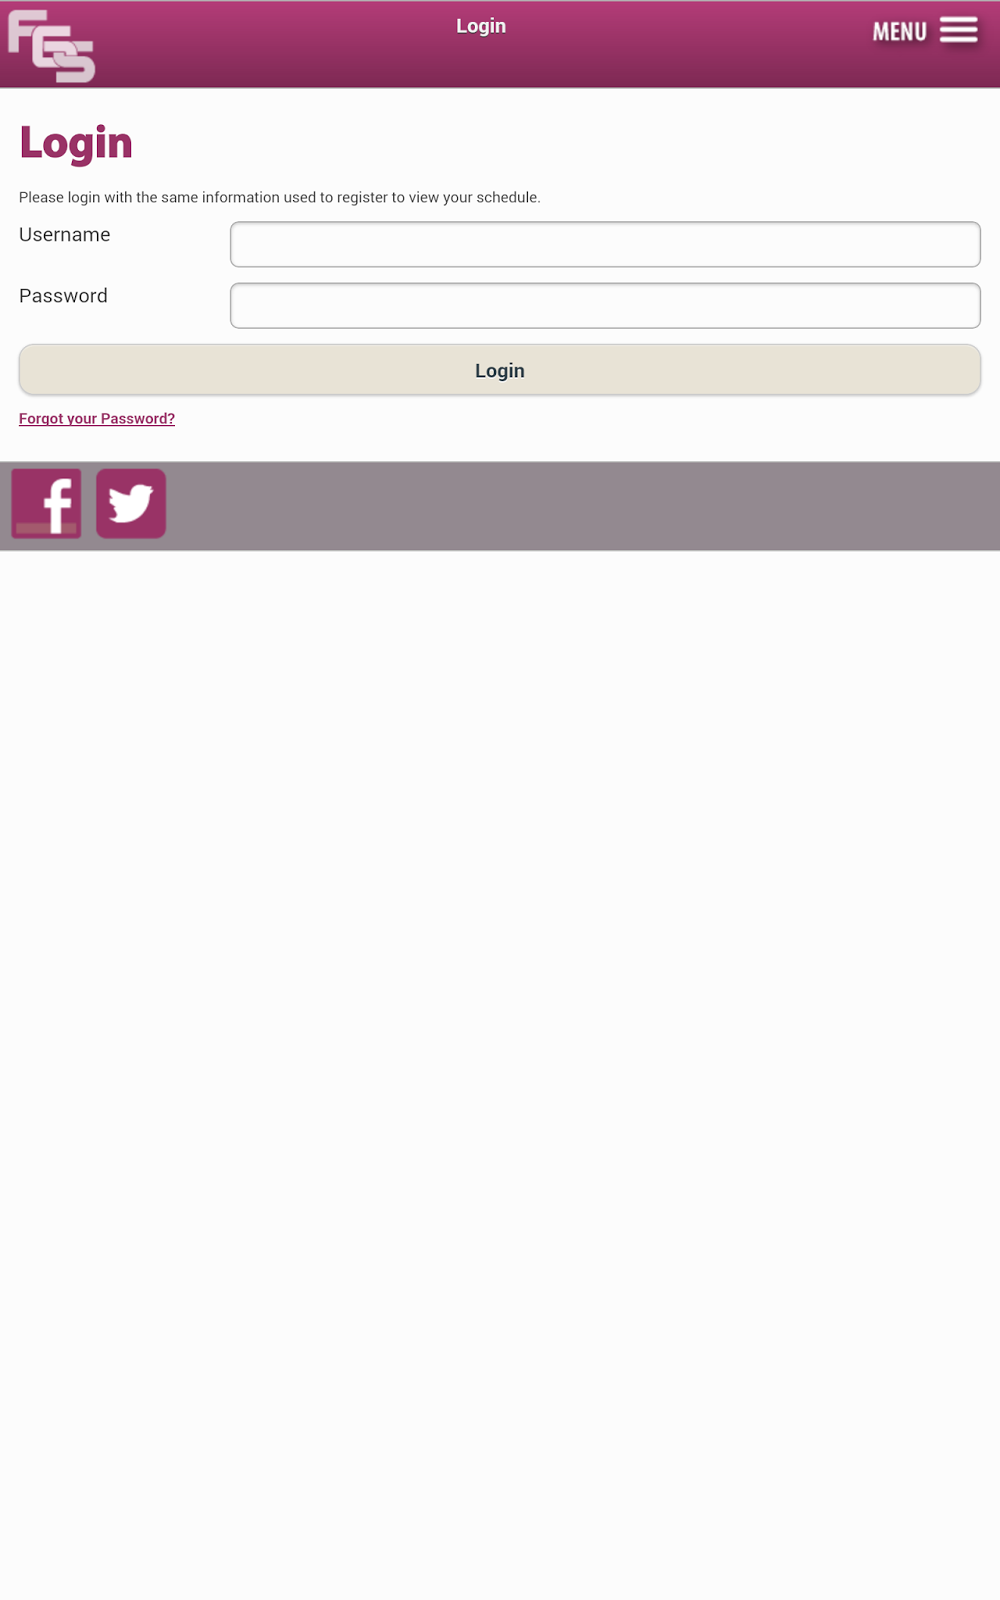 FGS App - Login